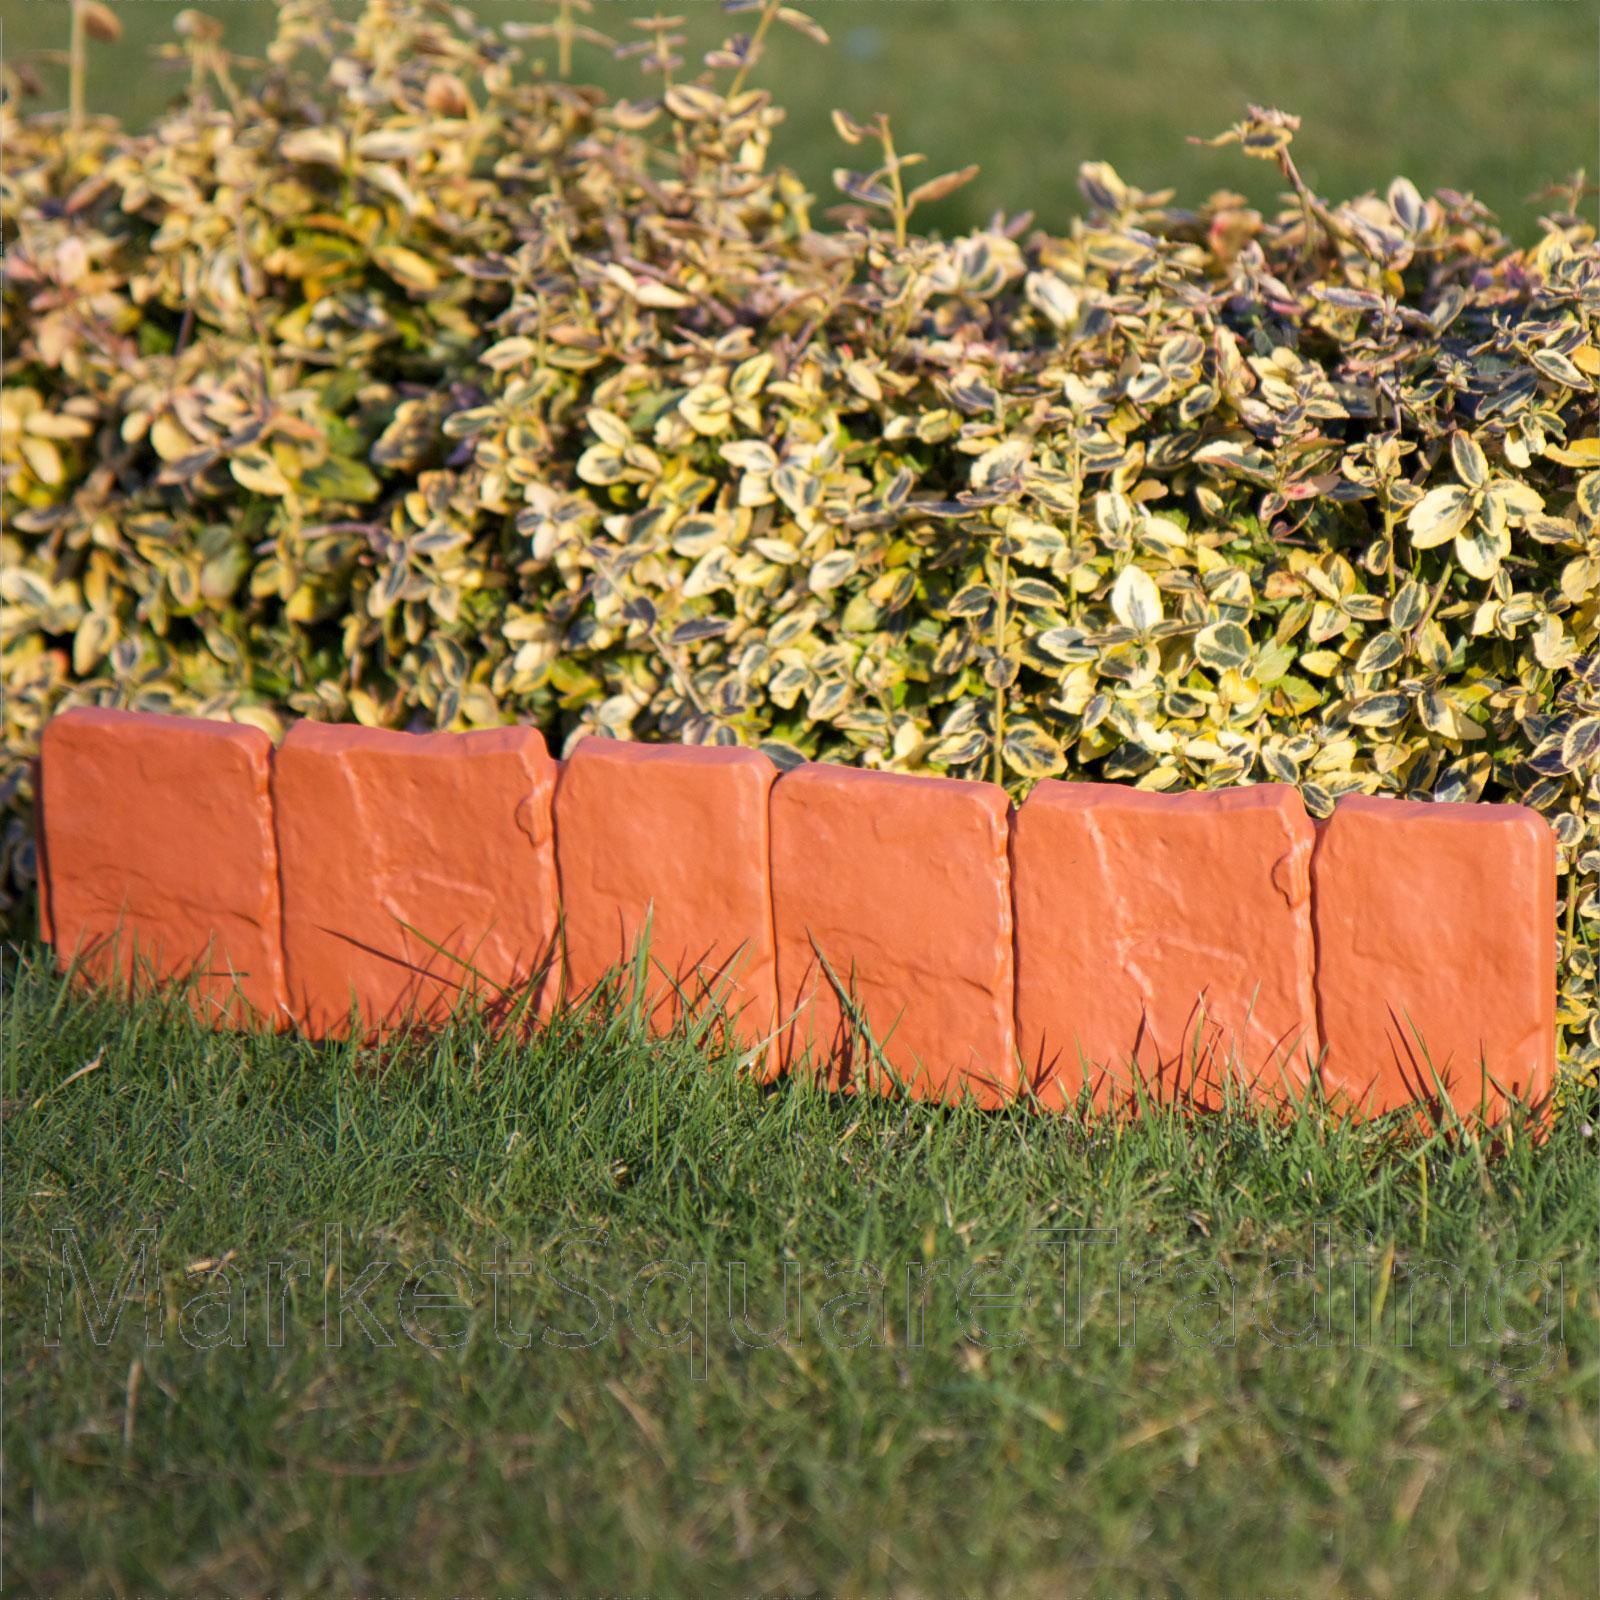 4 border edging fence lawn border fence garden grass driveway